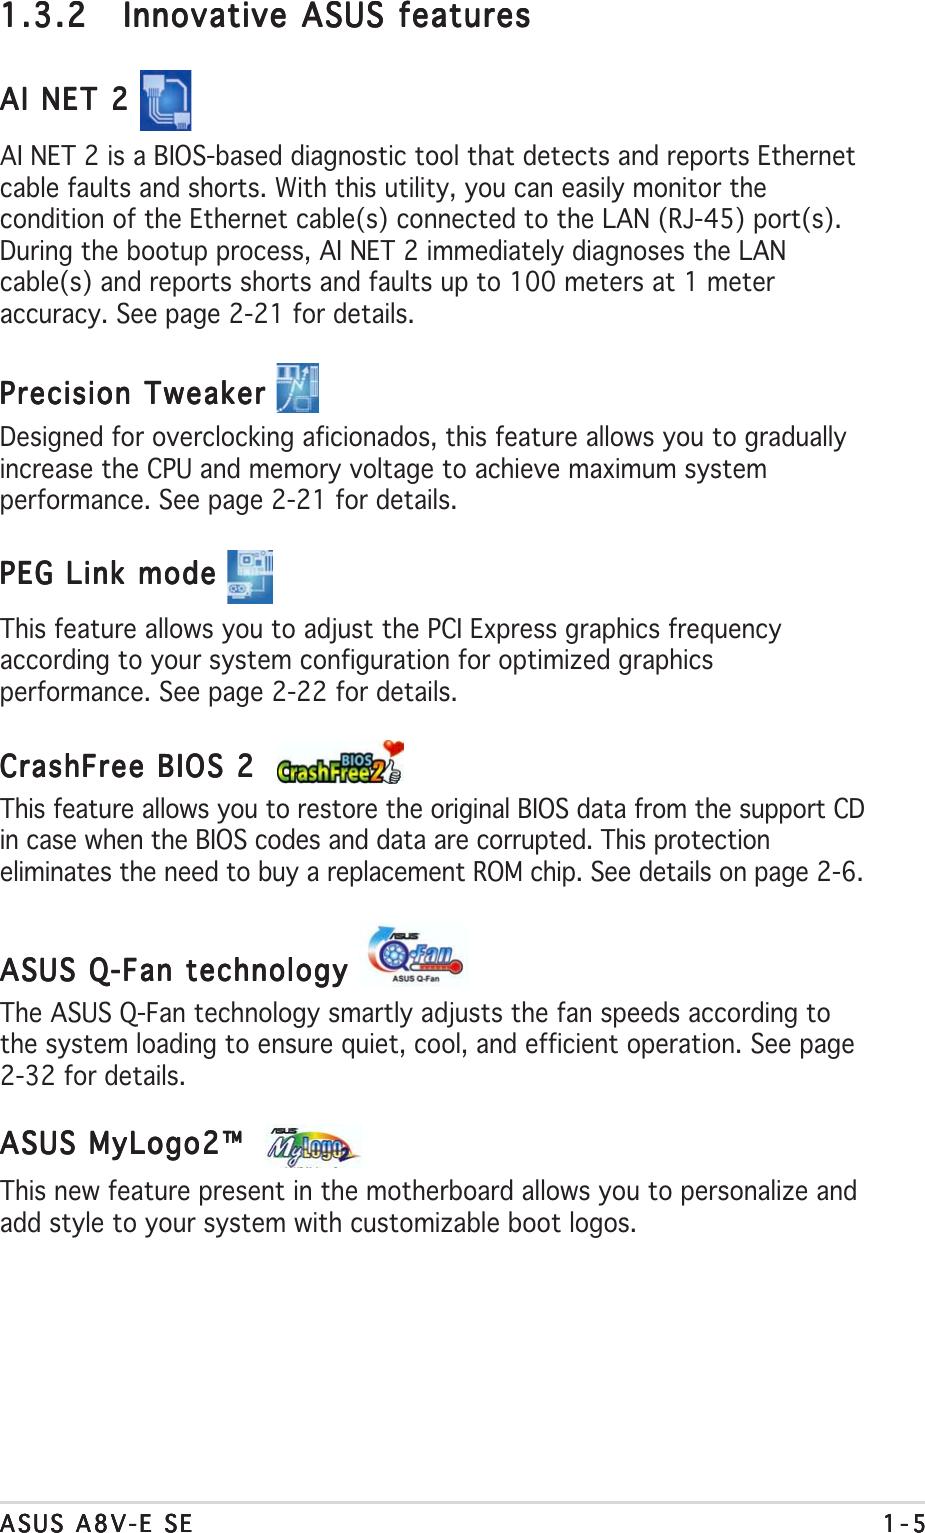 Asus Computer Hardware A8V E Se Users Manual +FRONT SE P65